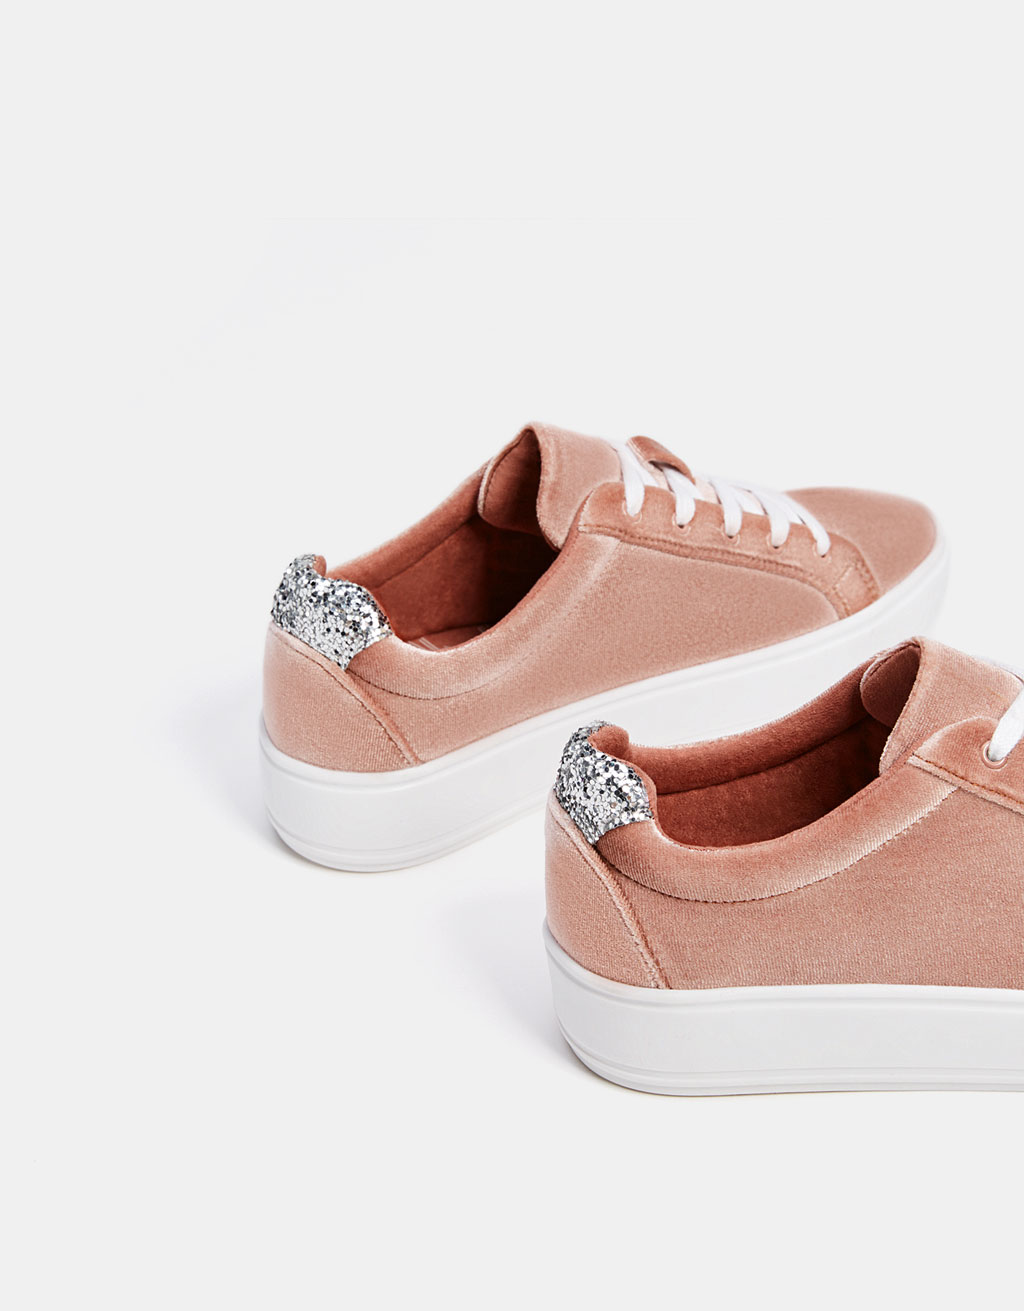 Velvet sneakers with glittery heels